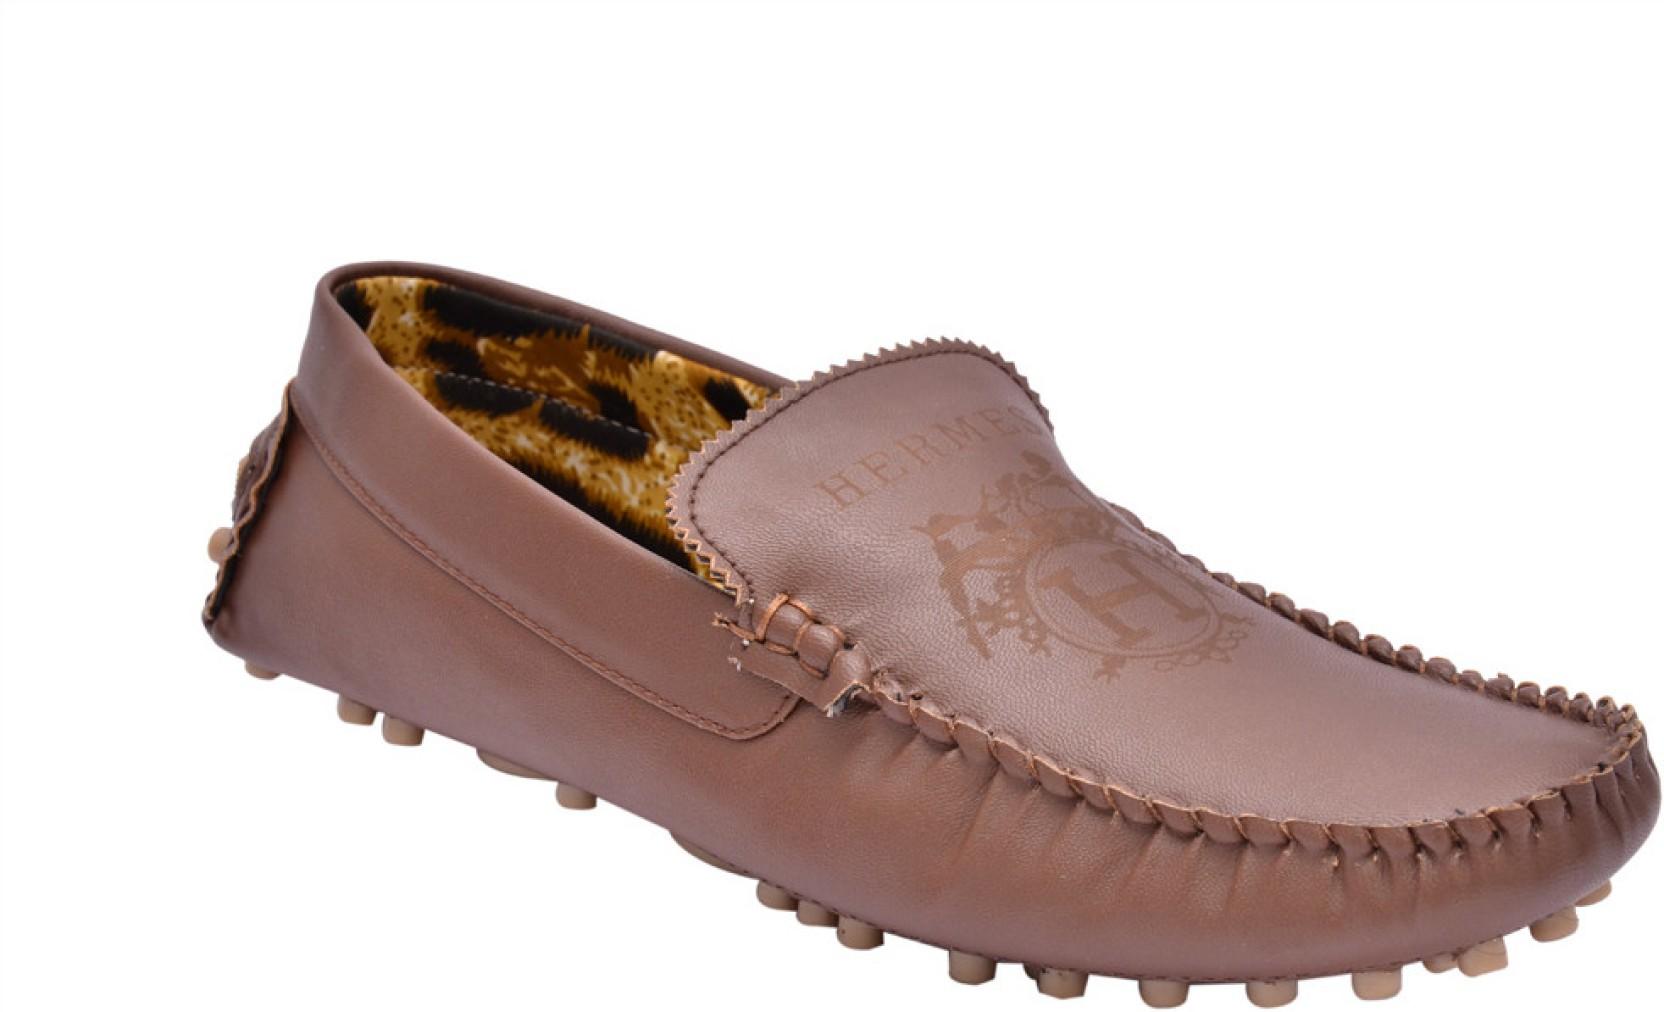 Fentacia Hermes Loafers - Buy Brown Color Fentacia Hermes Loafers Online At Best Price - Shop ...